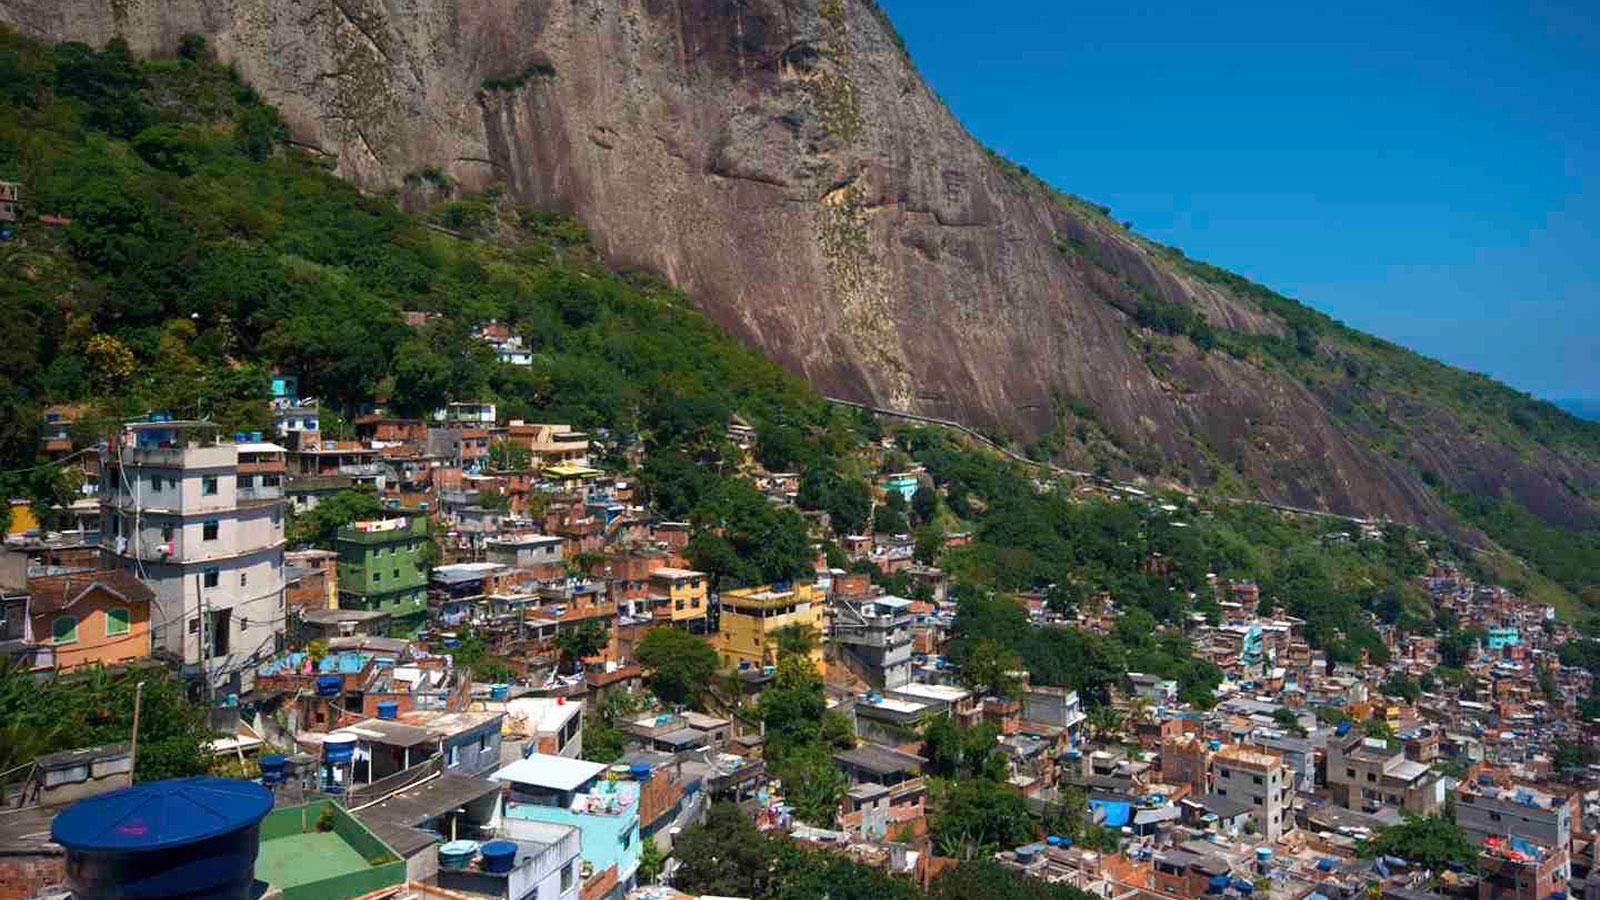 Favela in Rocinha, Brazil